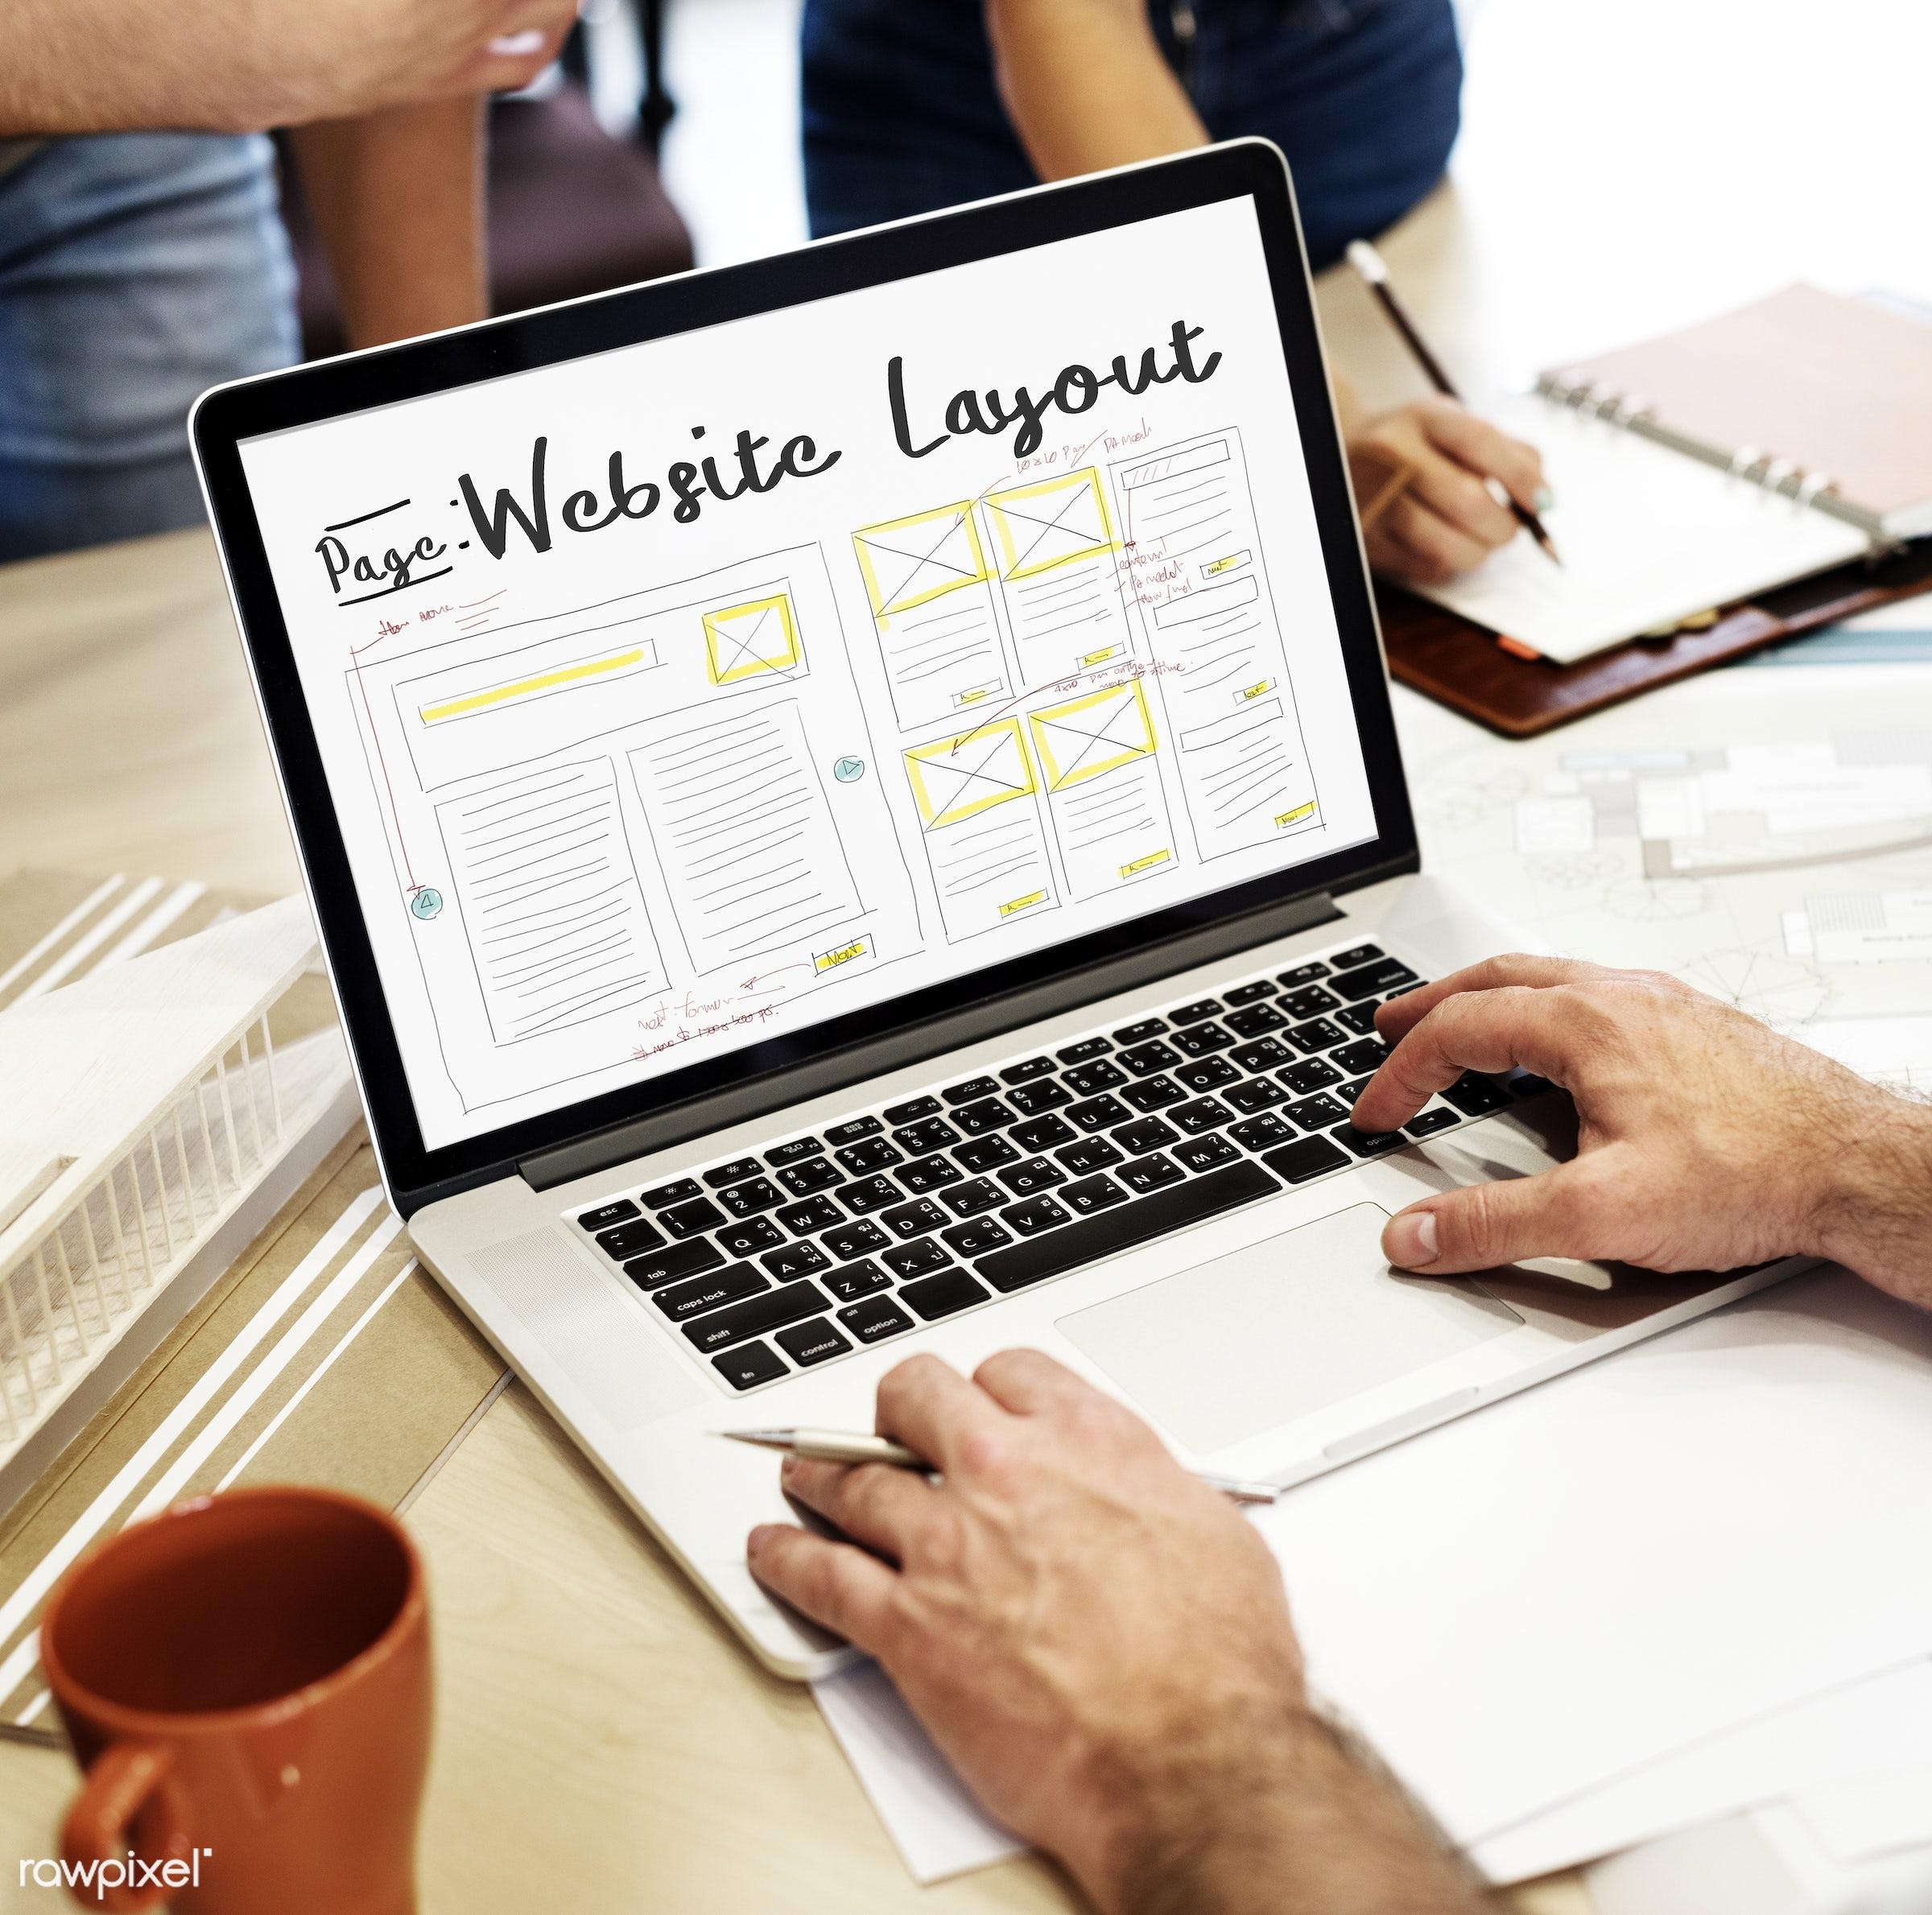 architect, architecture, art, blog, blogging, blueprint, coding, coffee, coffee cup, cup, design, develop, device, digital...